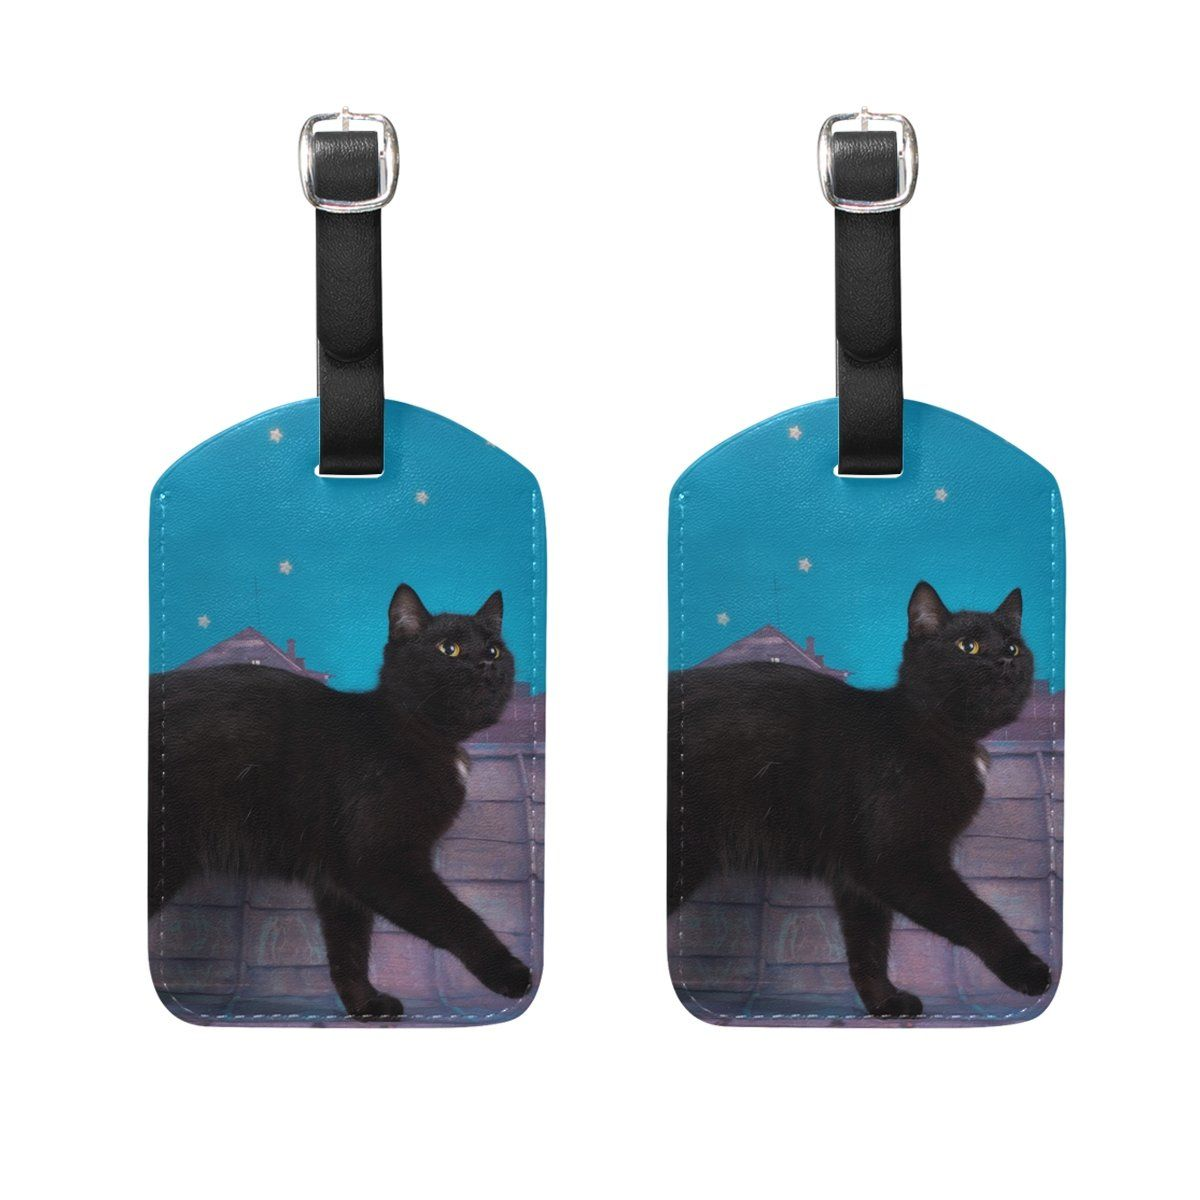 ALAZA Kawaii Black Cat Leather Passport Holder Cover Case Travel Wallet